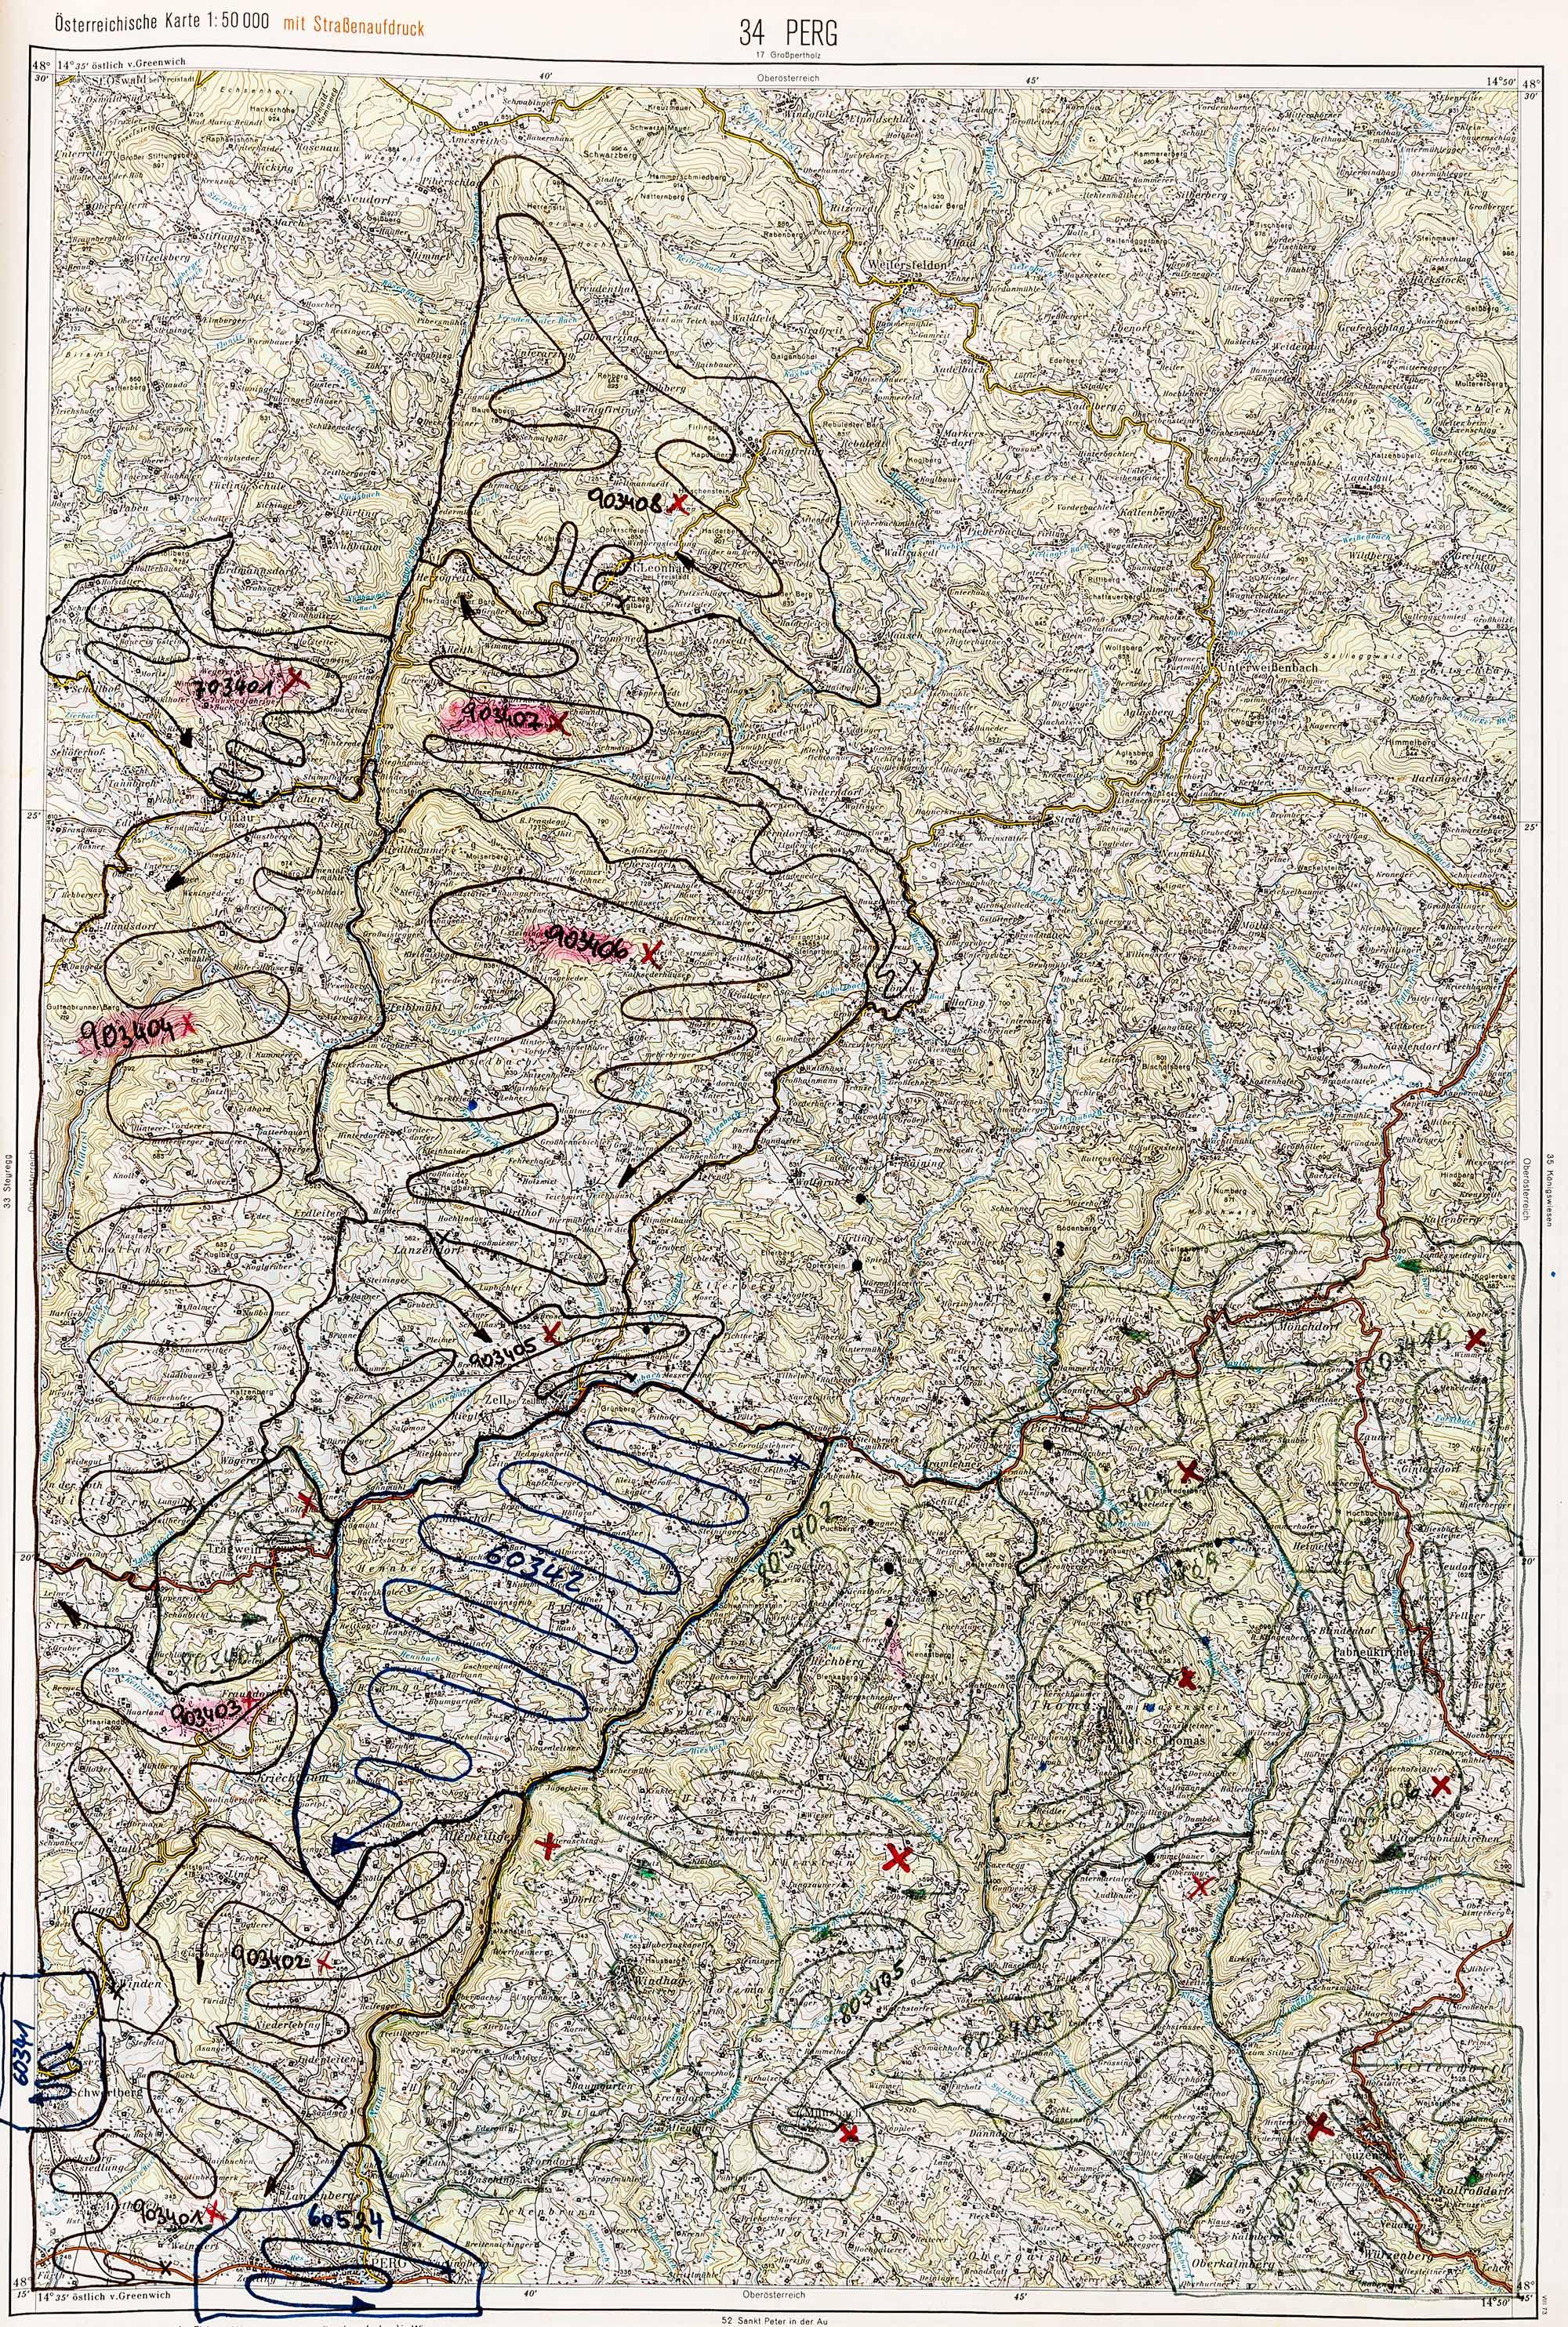 1975-1979 Karte 034